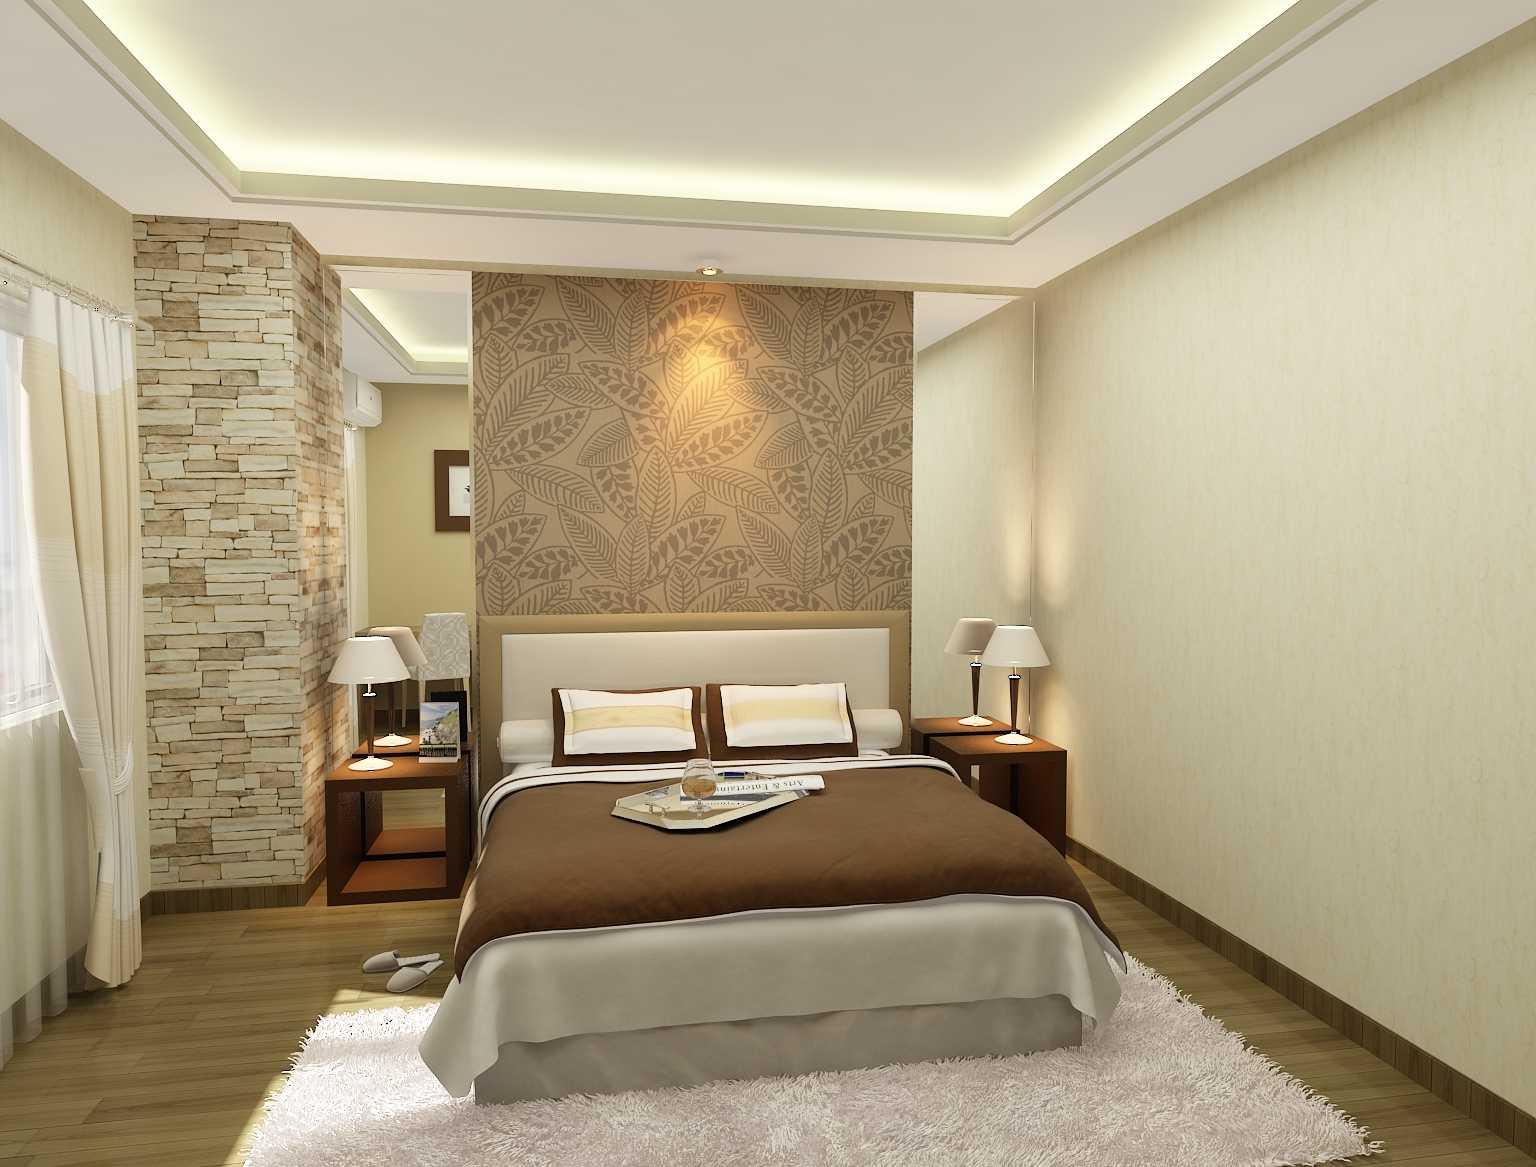 Conarch Studio Dwangsa Hap Hotel Solo Kota Surakarta, Jawa Tengah, Indonesia Kota Surakarta, Jawa Tengah, Indonesia Conarch-Bangun-Sejahtera-Dwangsa-Hap-Hotel-Solo  59935